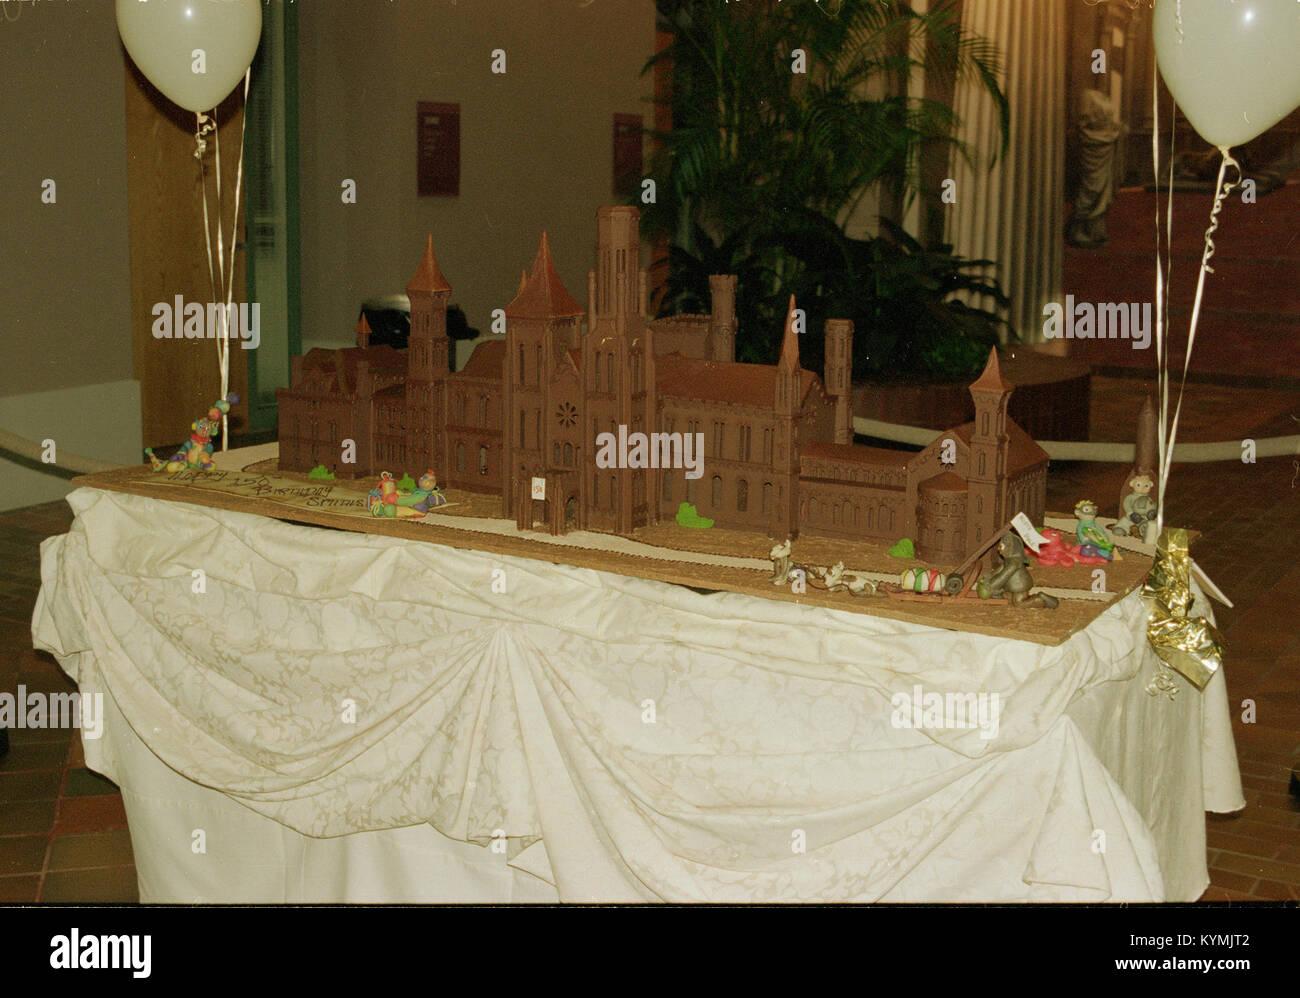 150e anniversaire Cake en forme de la Smithsonian Institution Building 2551533314 o Photo Stock